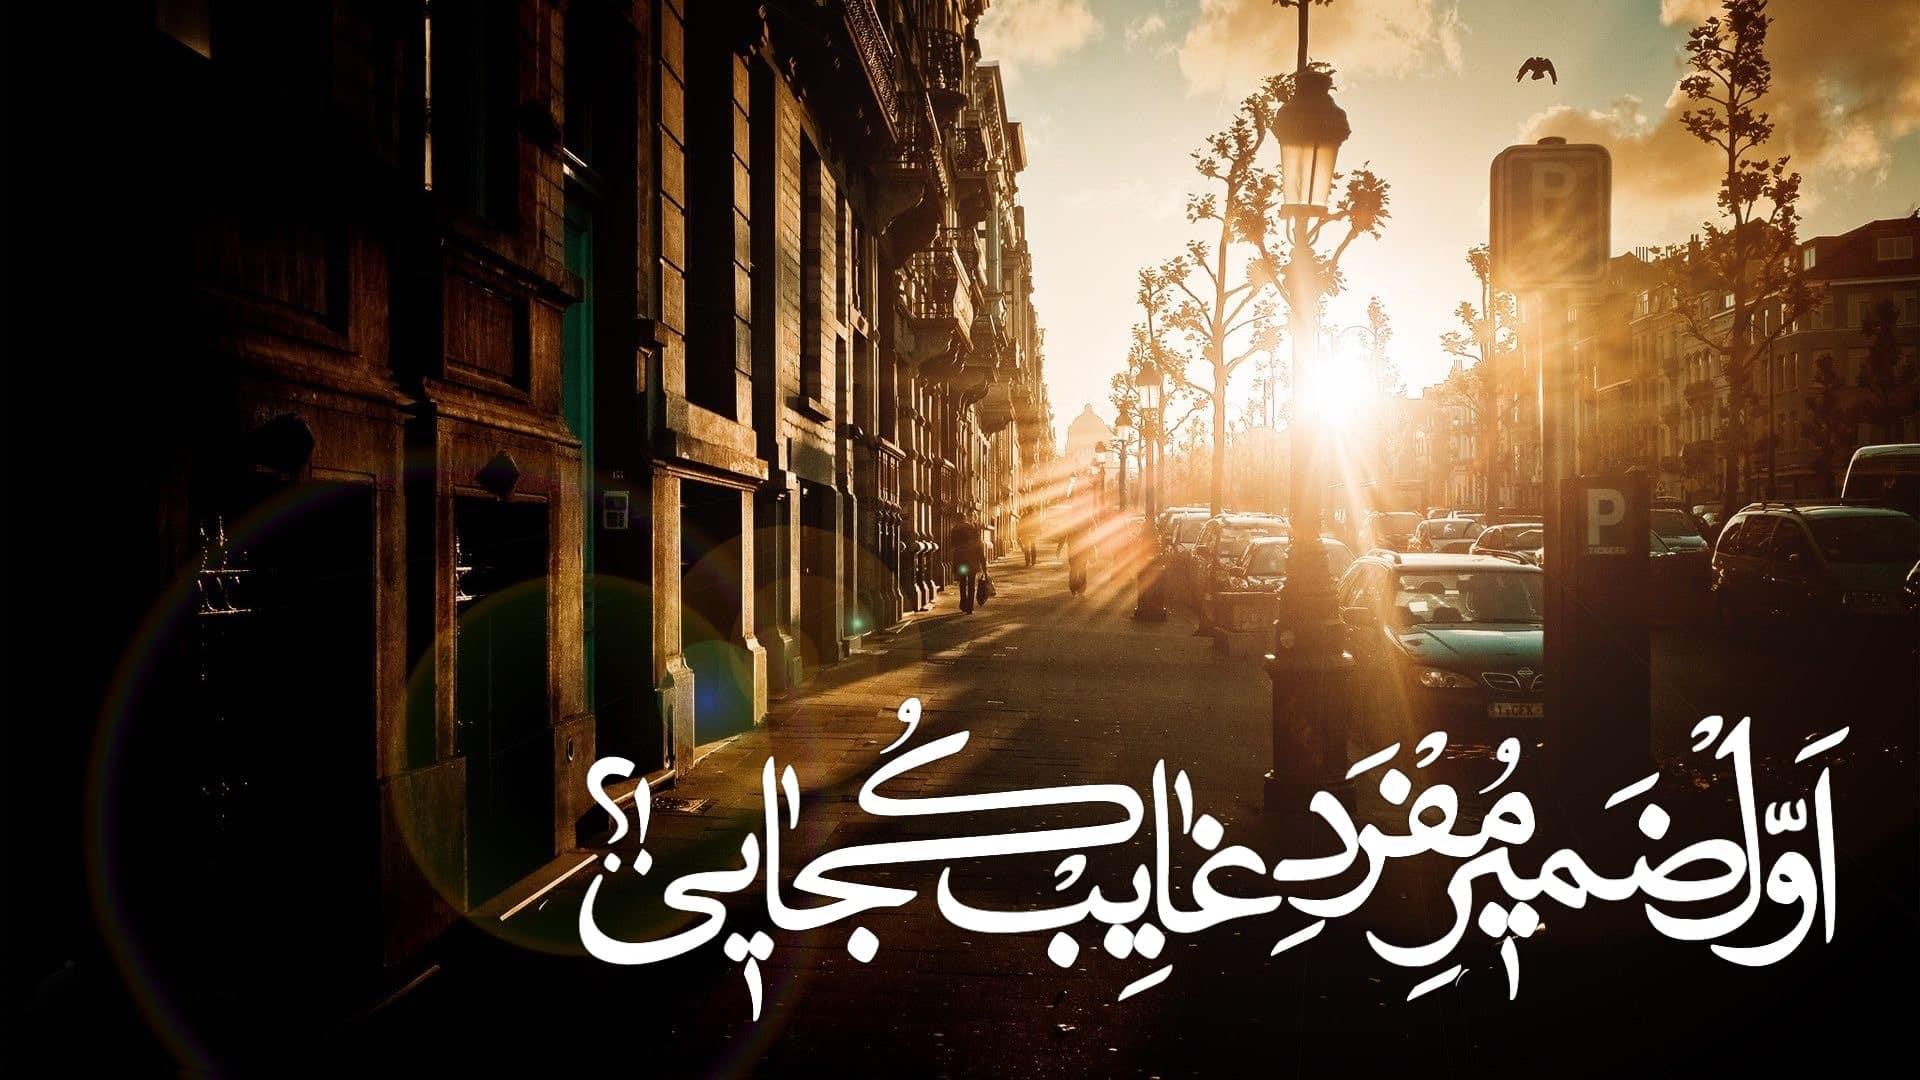 aksneshte mahdavi 8 min - عکس نوشته های مهدوی